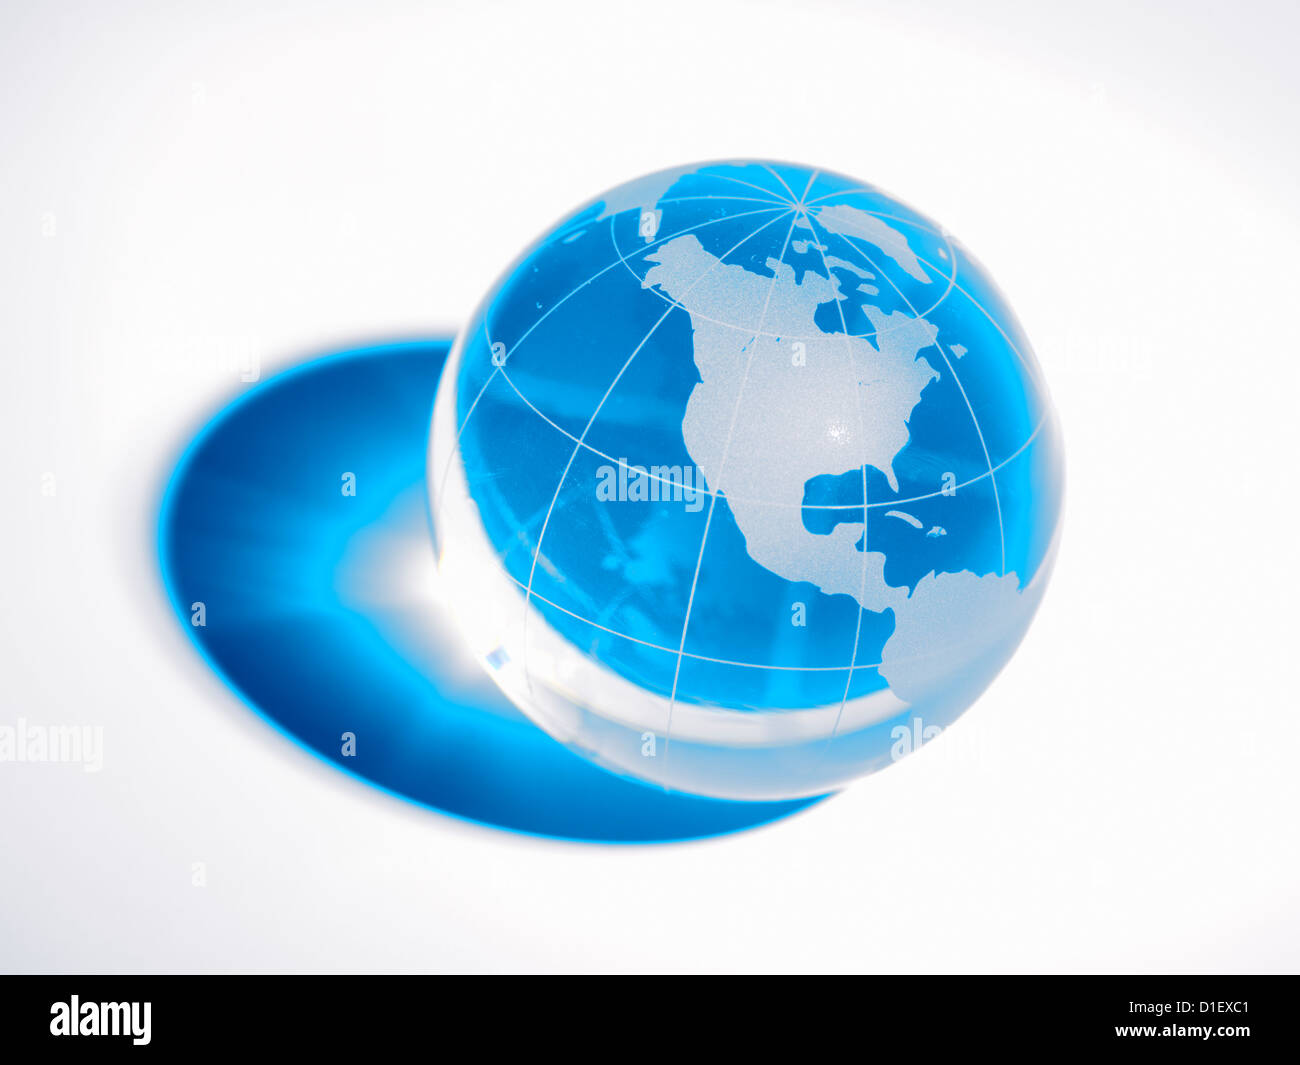 Globo de Cristal sobre fondo blanco. Imagen De Stock